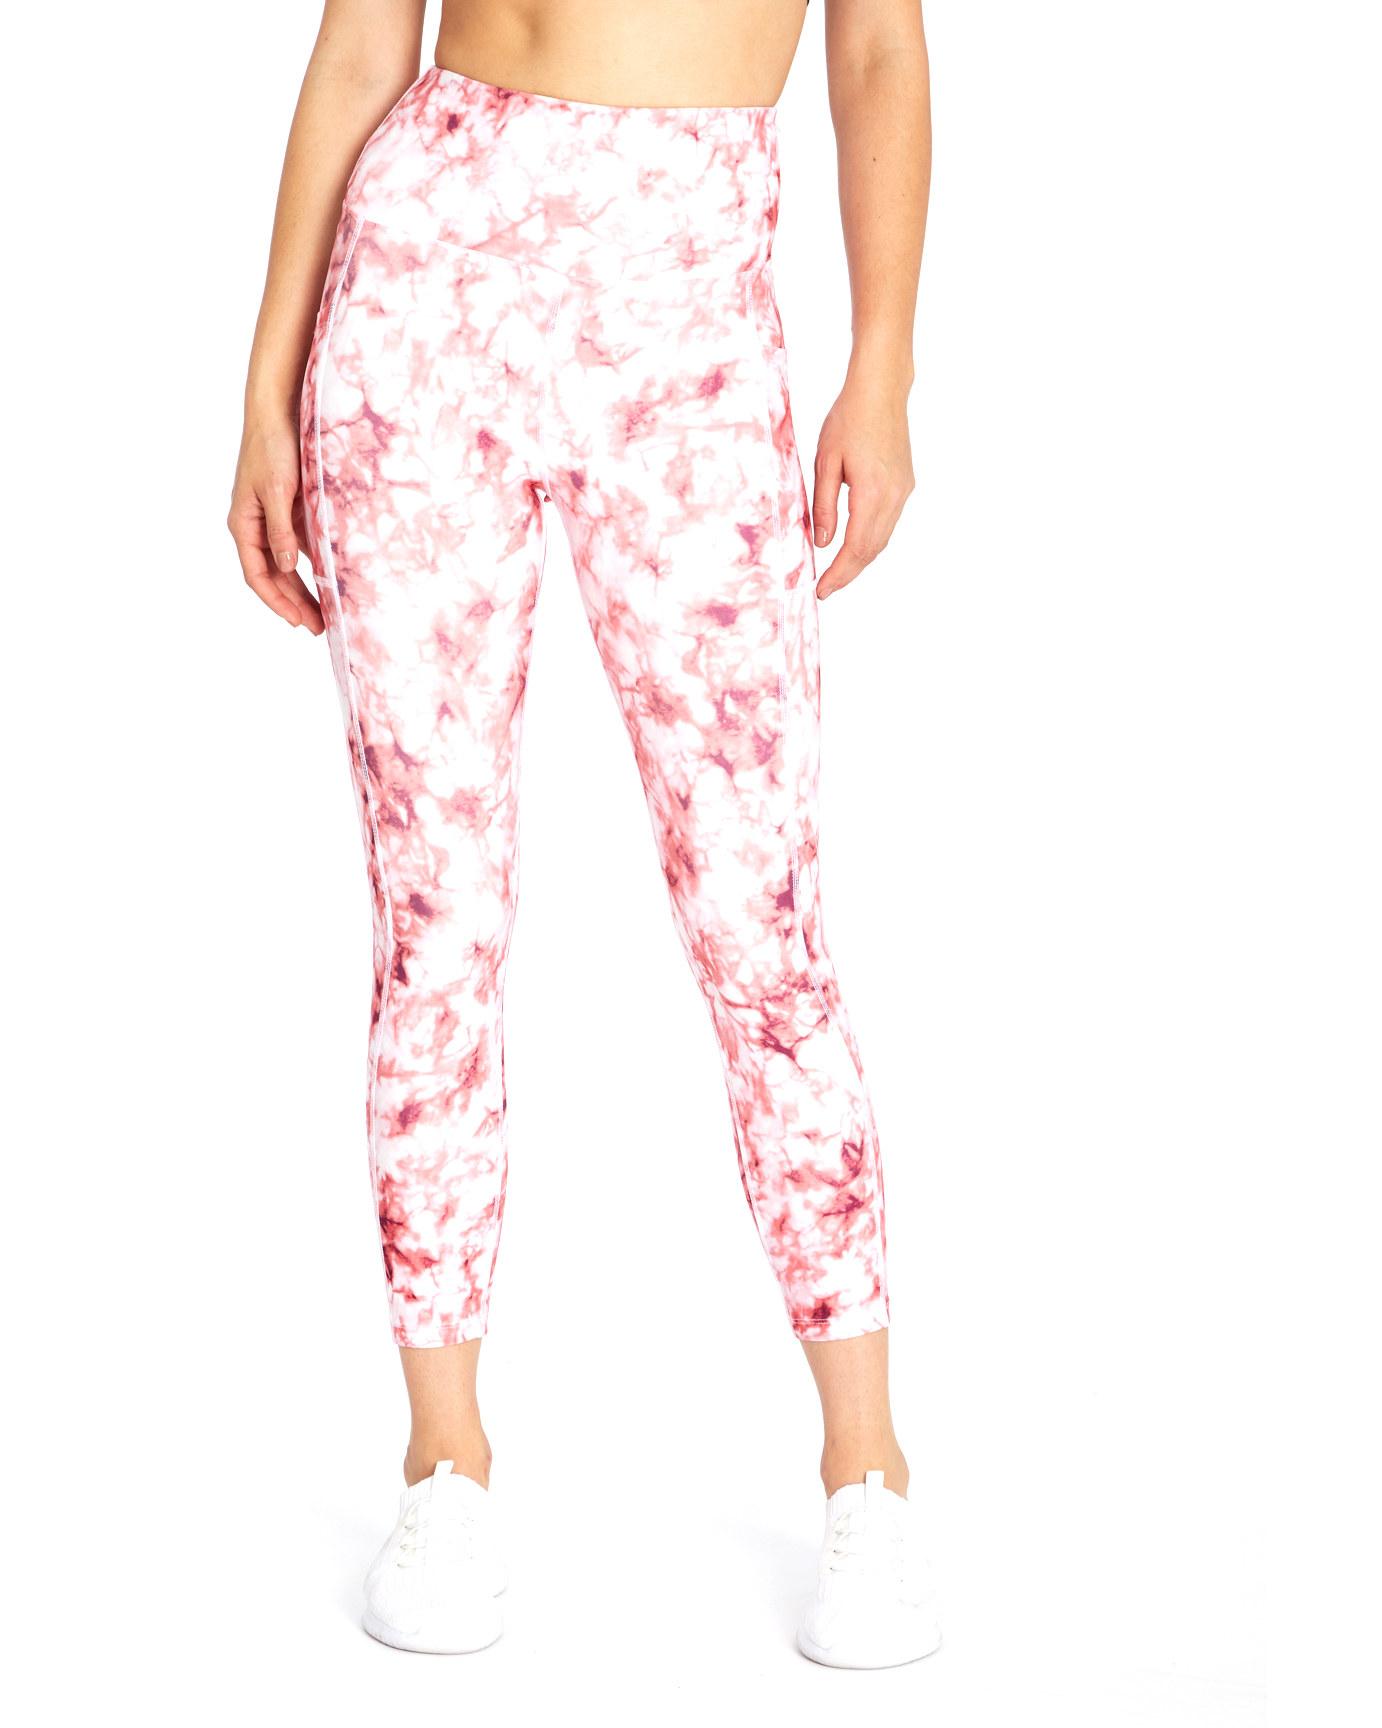 model wearing pink and white tie dye leggings